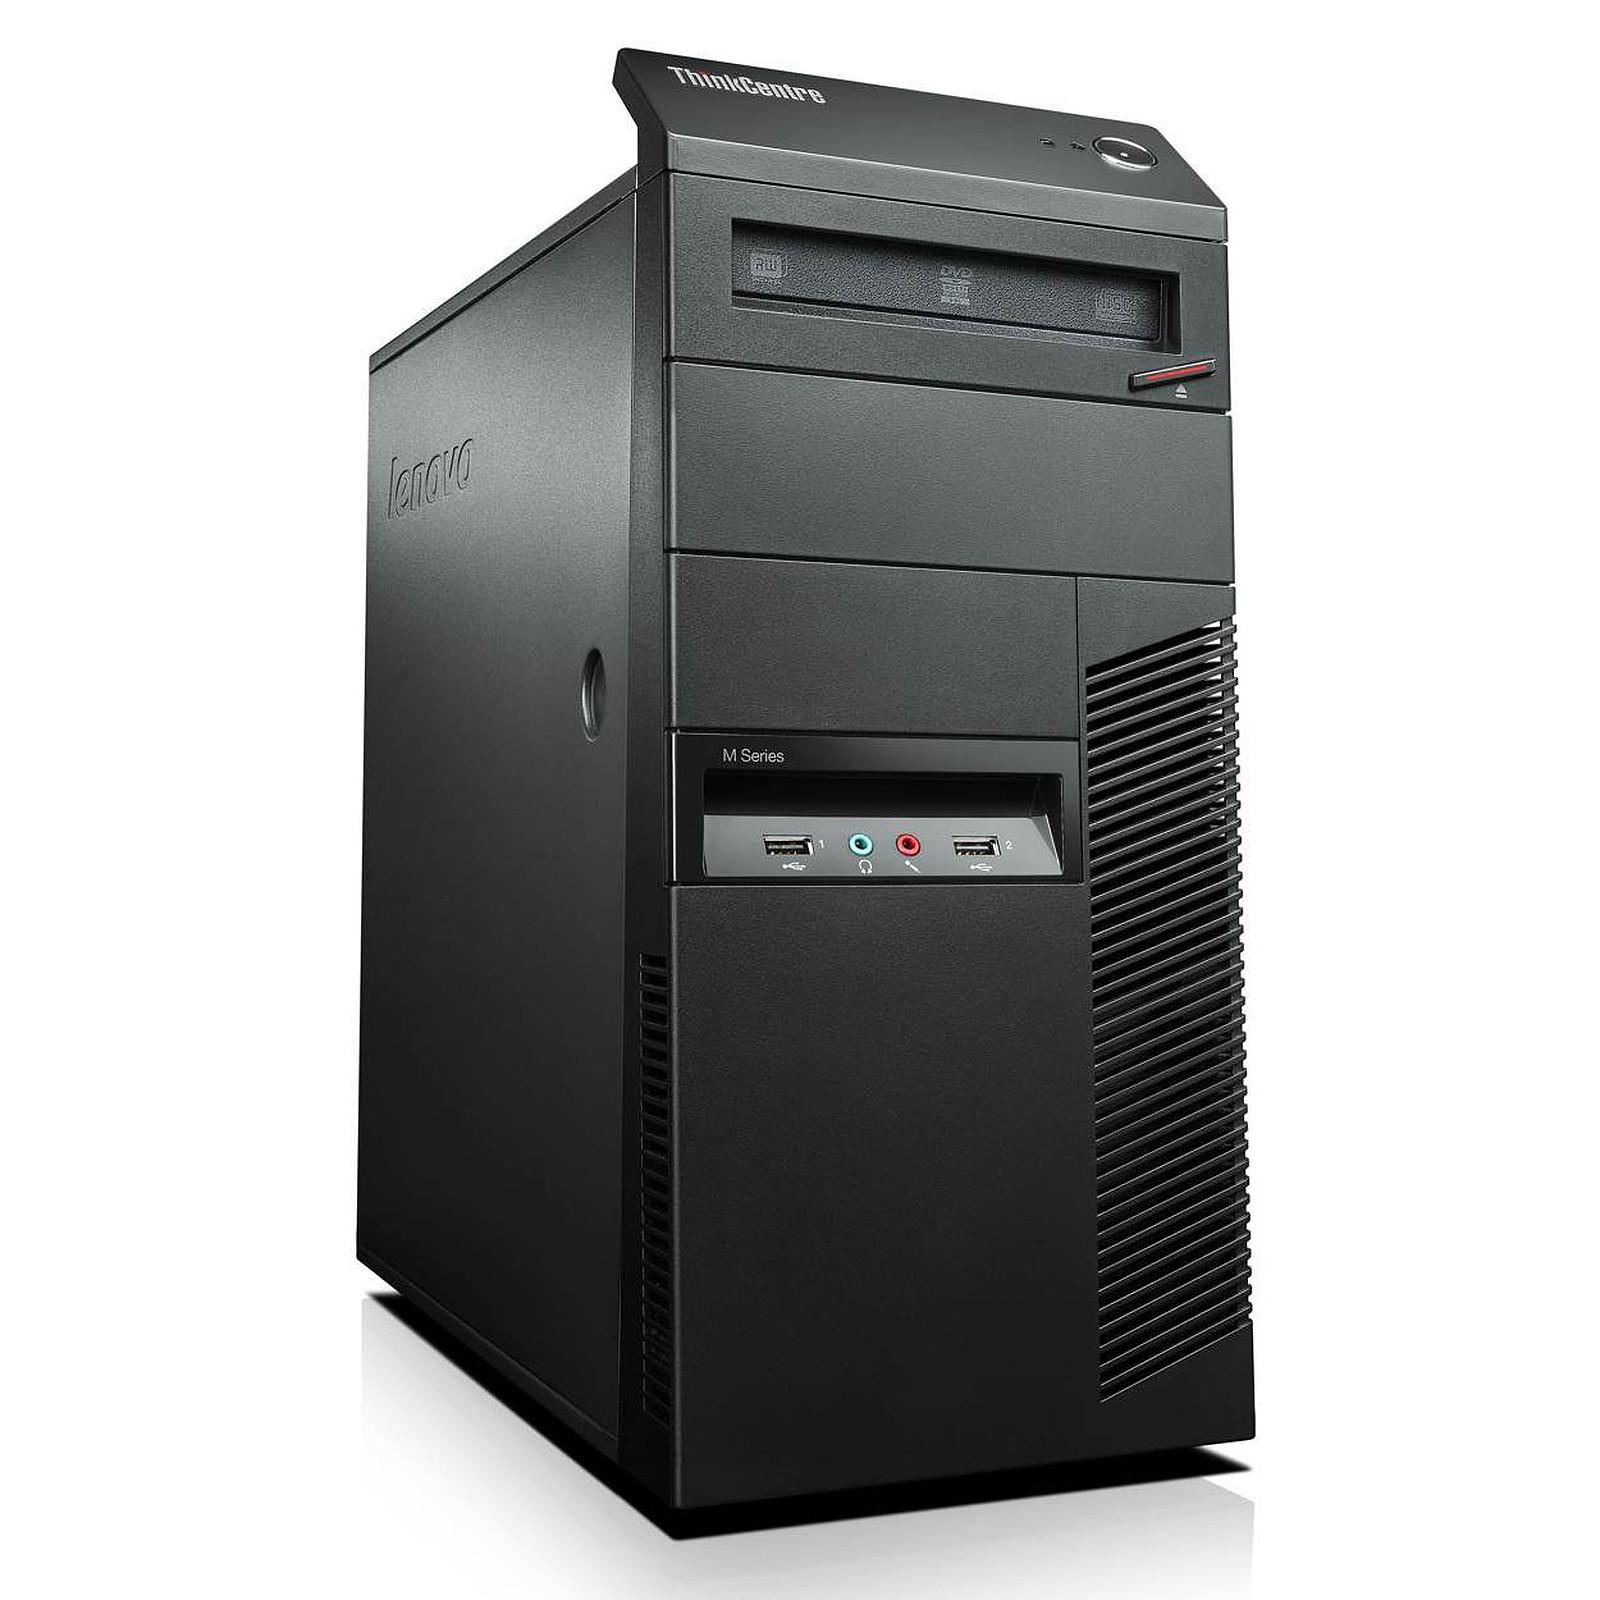 Lenovo ThinkCentre M93p Core i5 3,2 GHz - HDD 500 Go RAM 4 Go